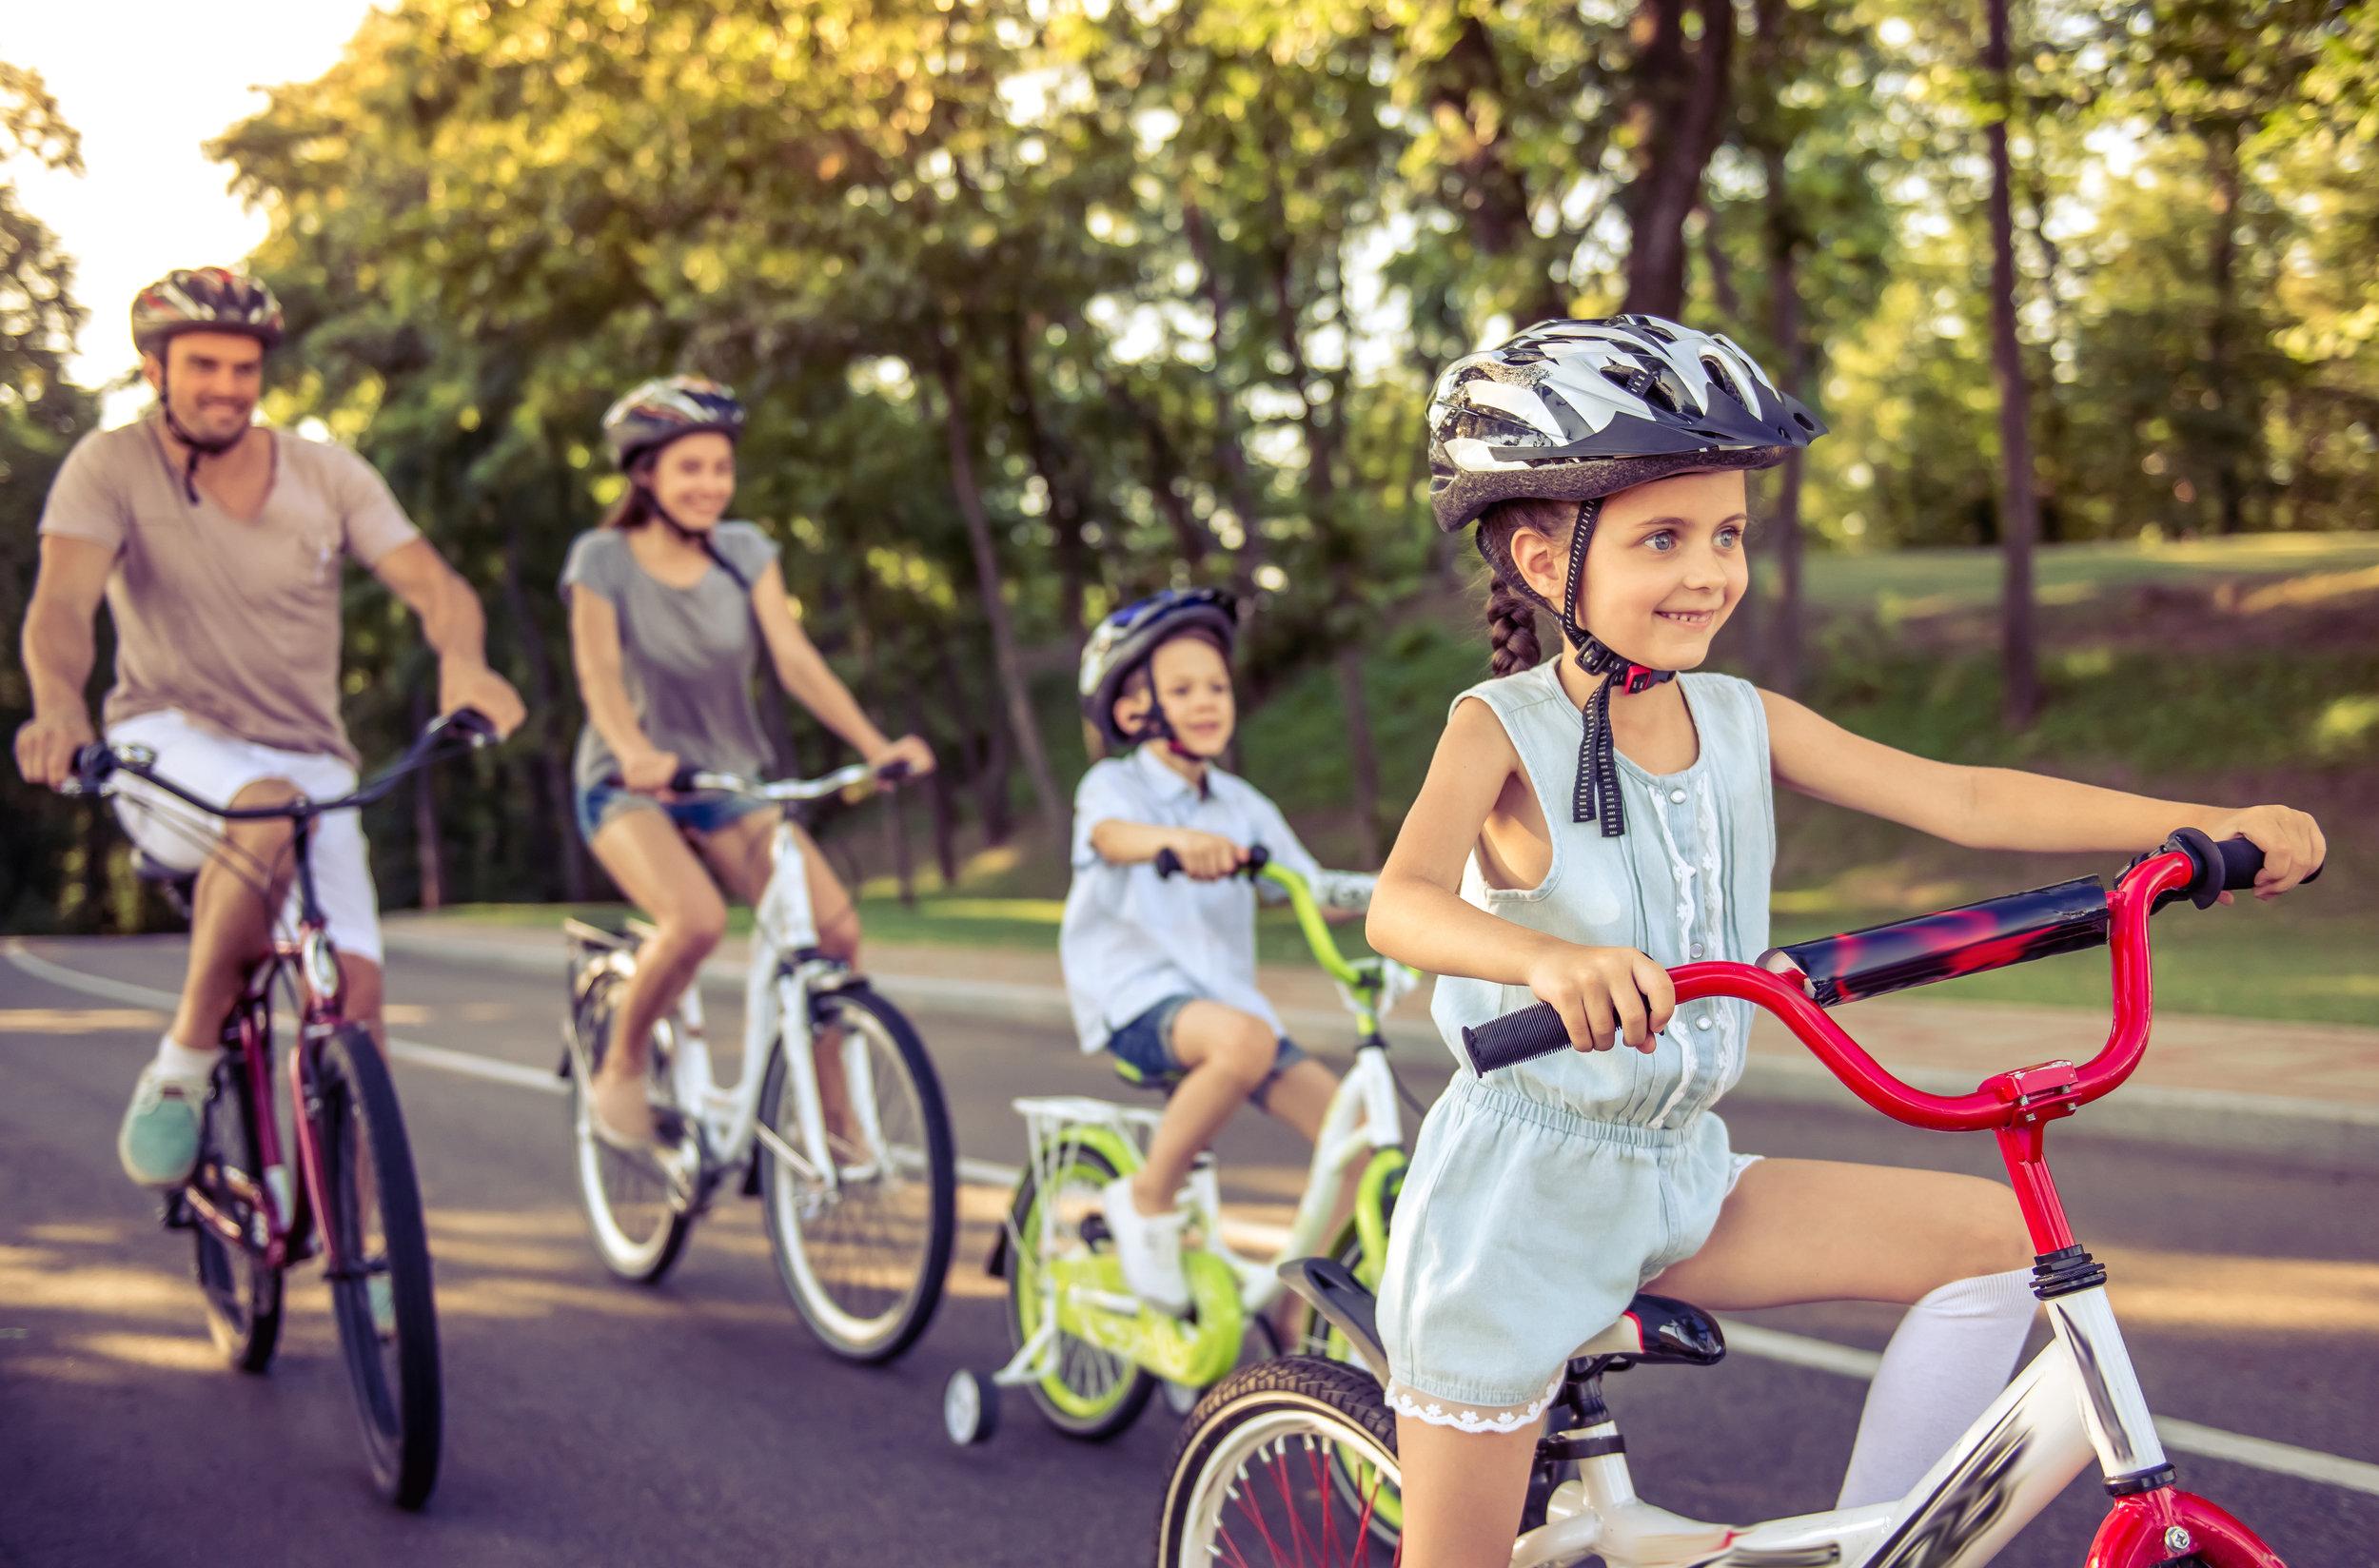 family-riding-bikes.jpg